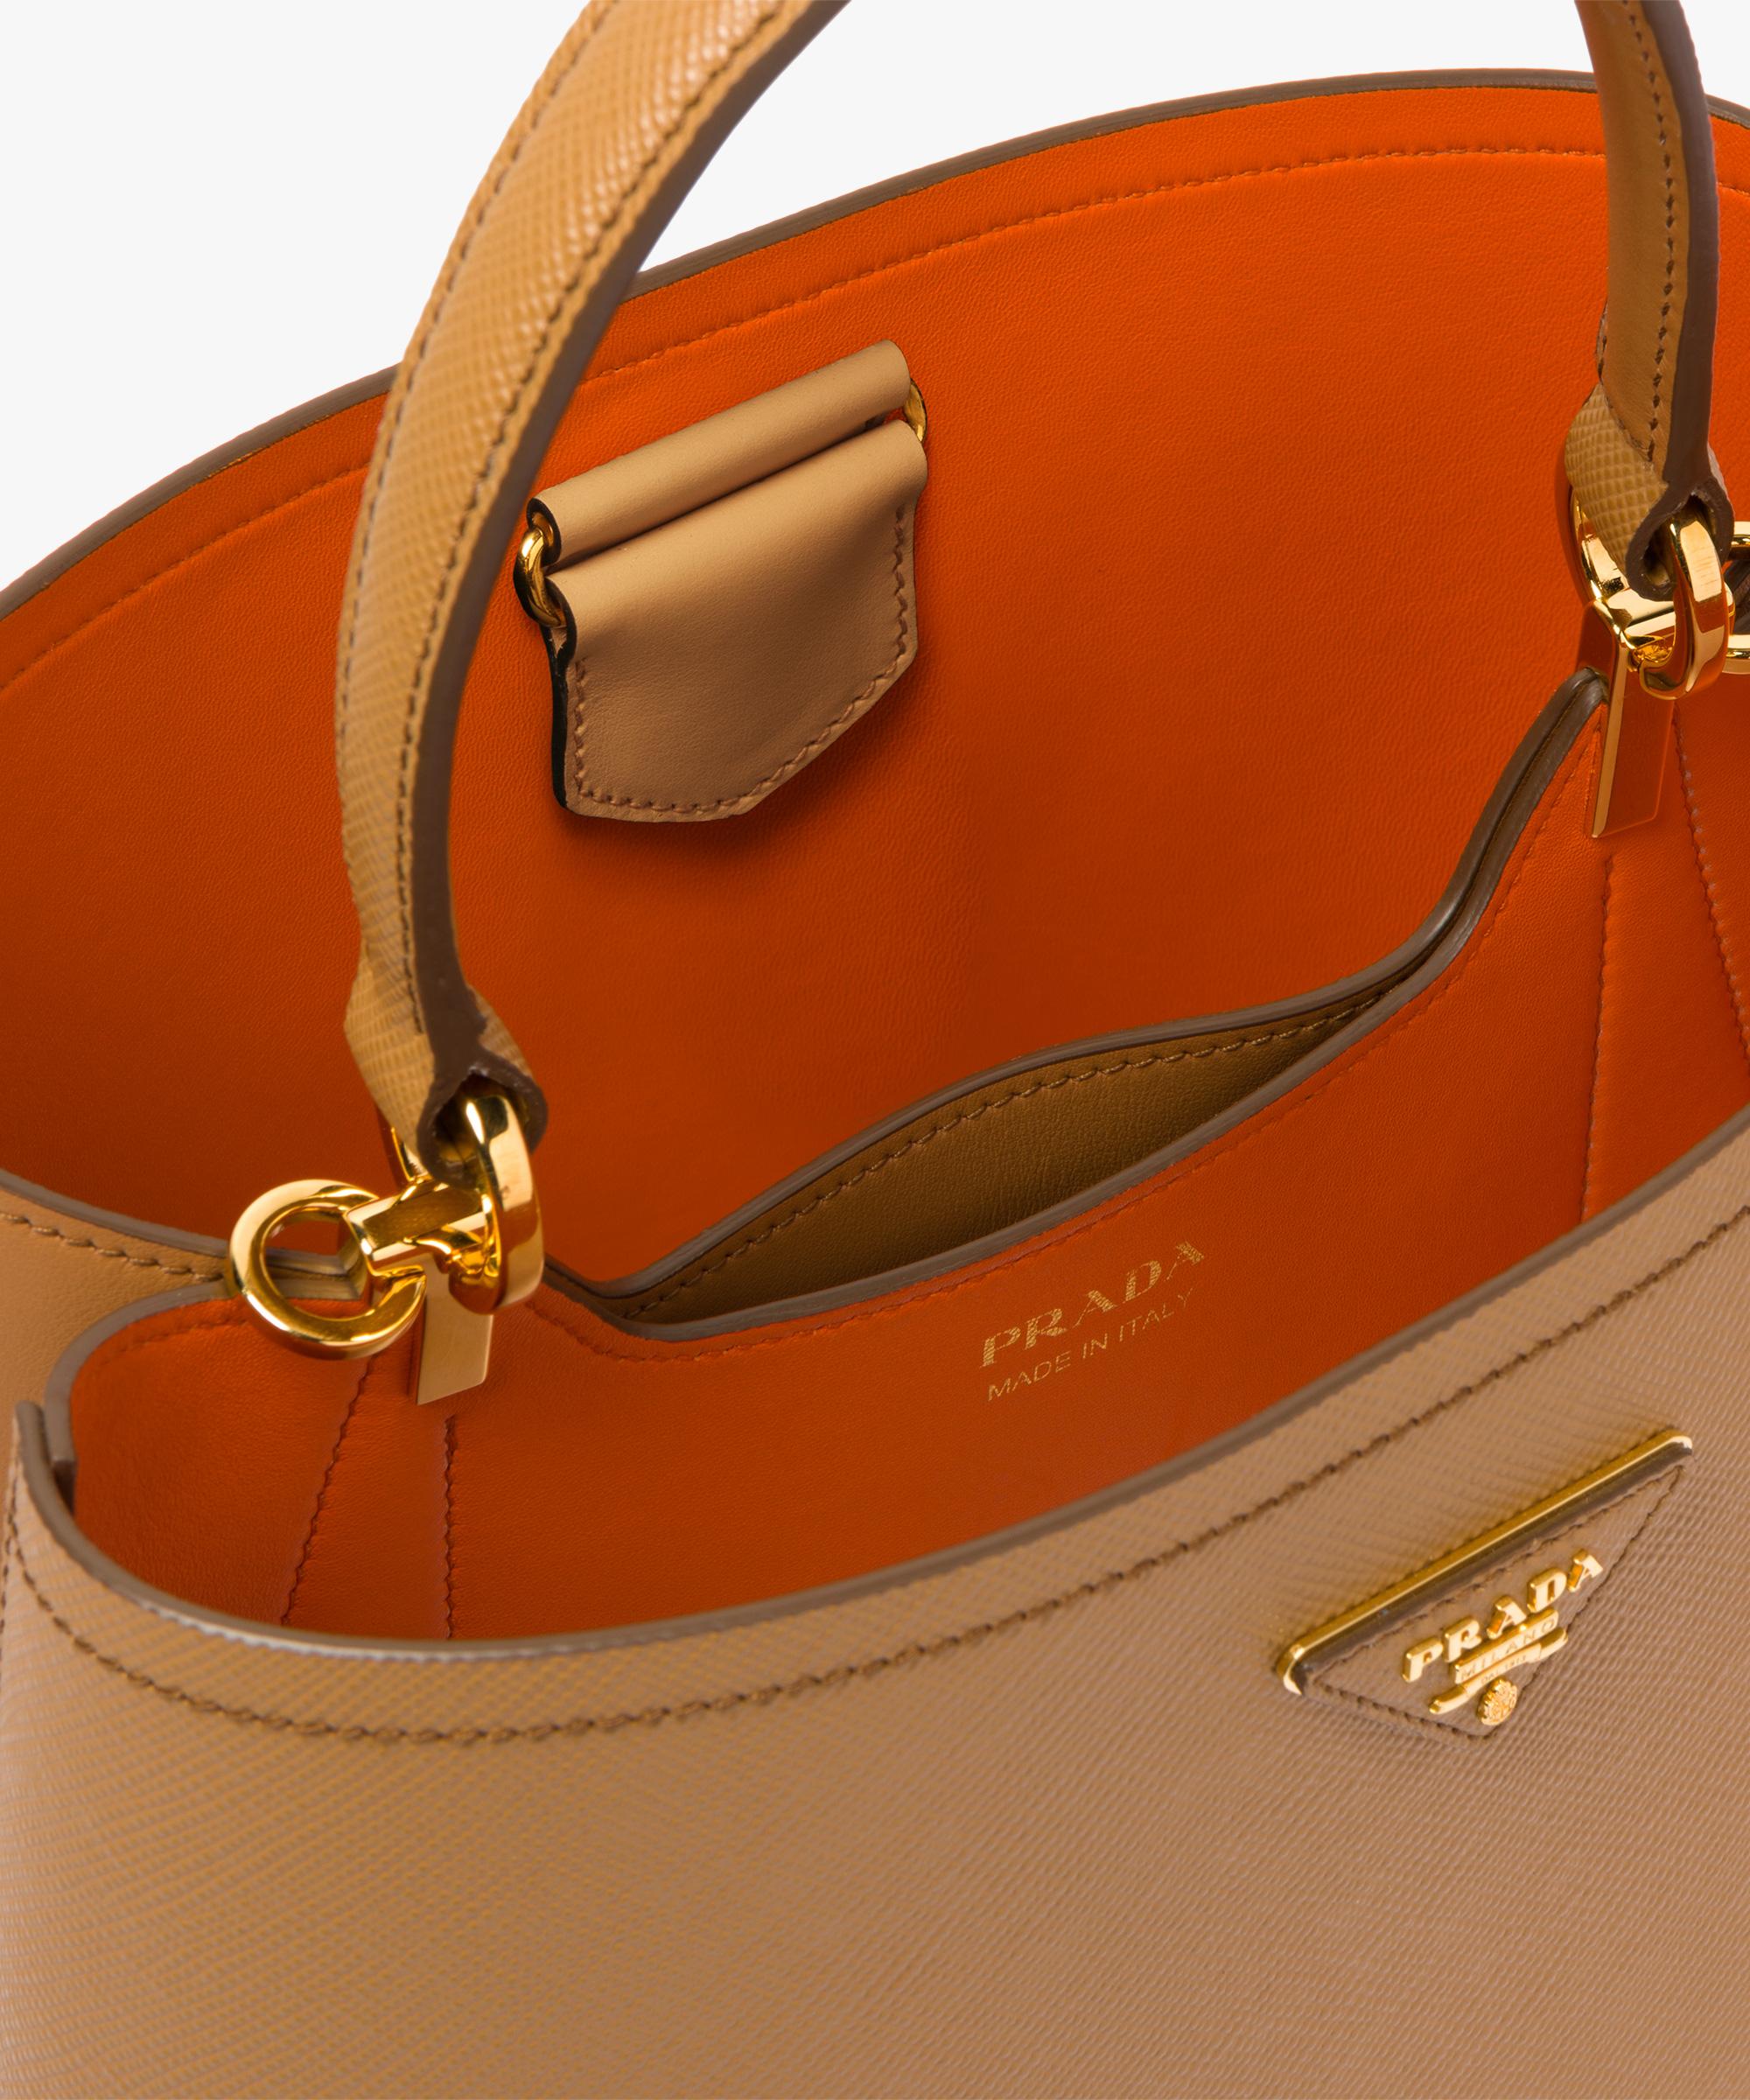 6fec938dce8d35 ... authentic prada double saffiano leather bag prada caramel papaya 96546  dc2a8